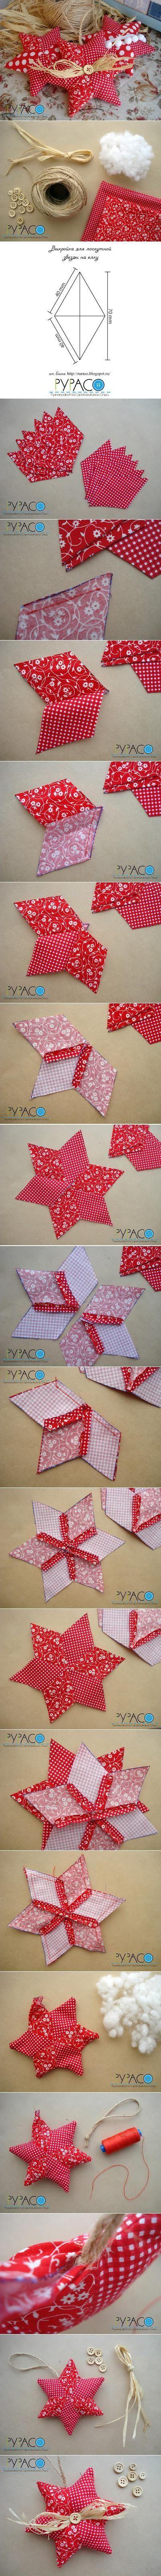 DIY Little Fabric Star DIY Little Fabric Star